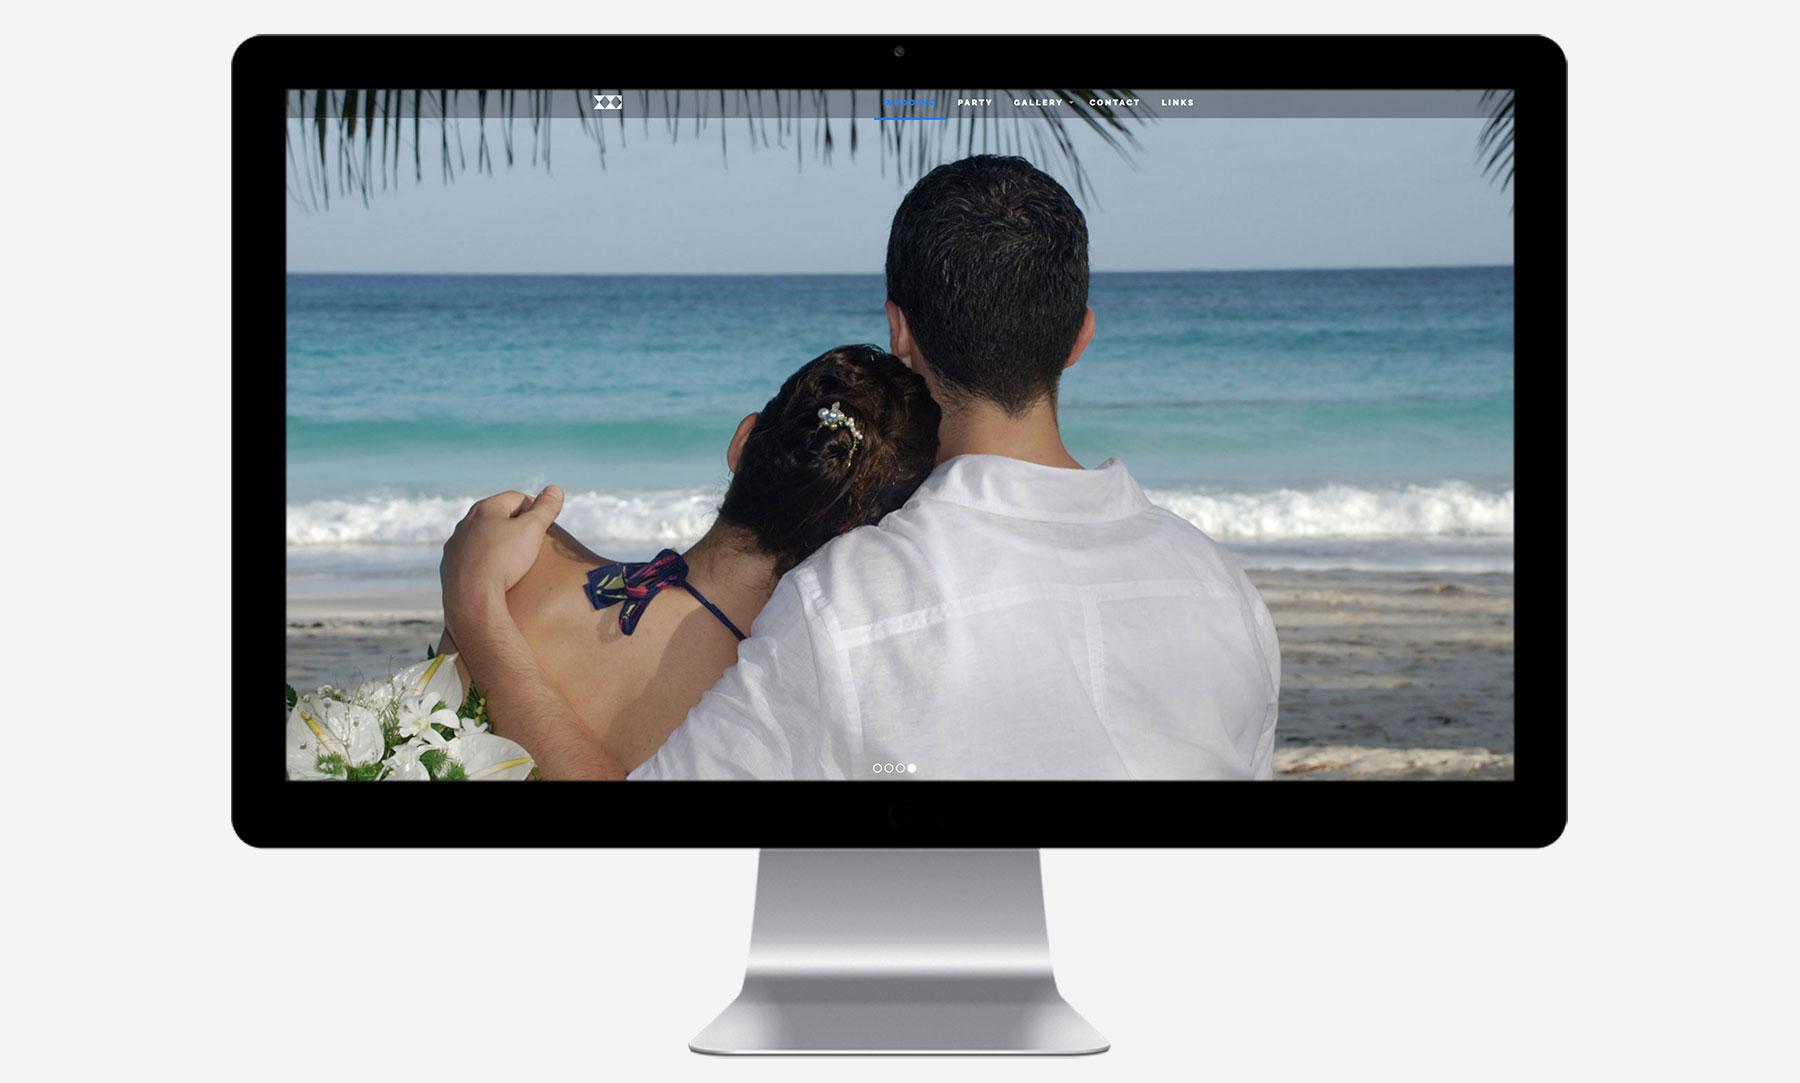 21 Juni: Desktop